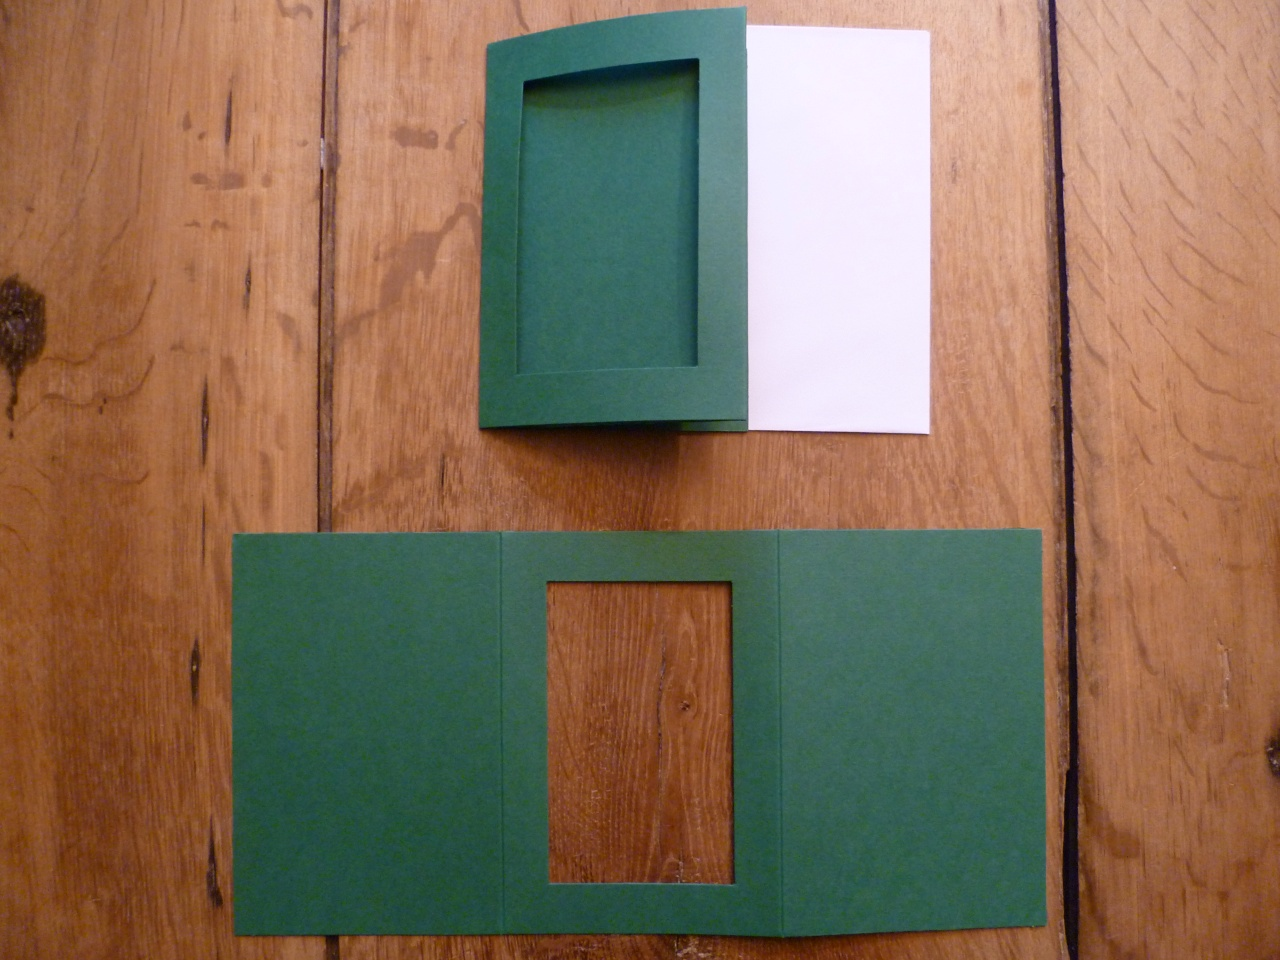 carte-3-volets-vertes-rectangulaires.jpg